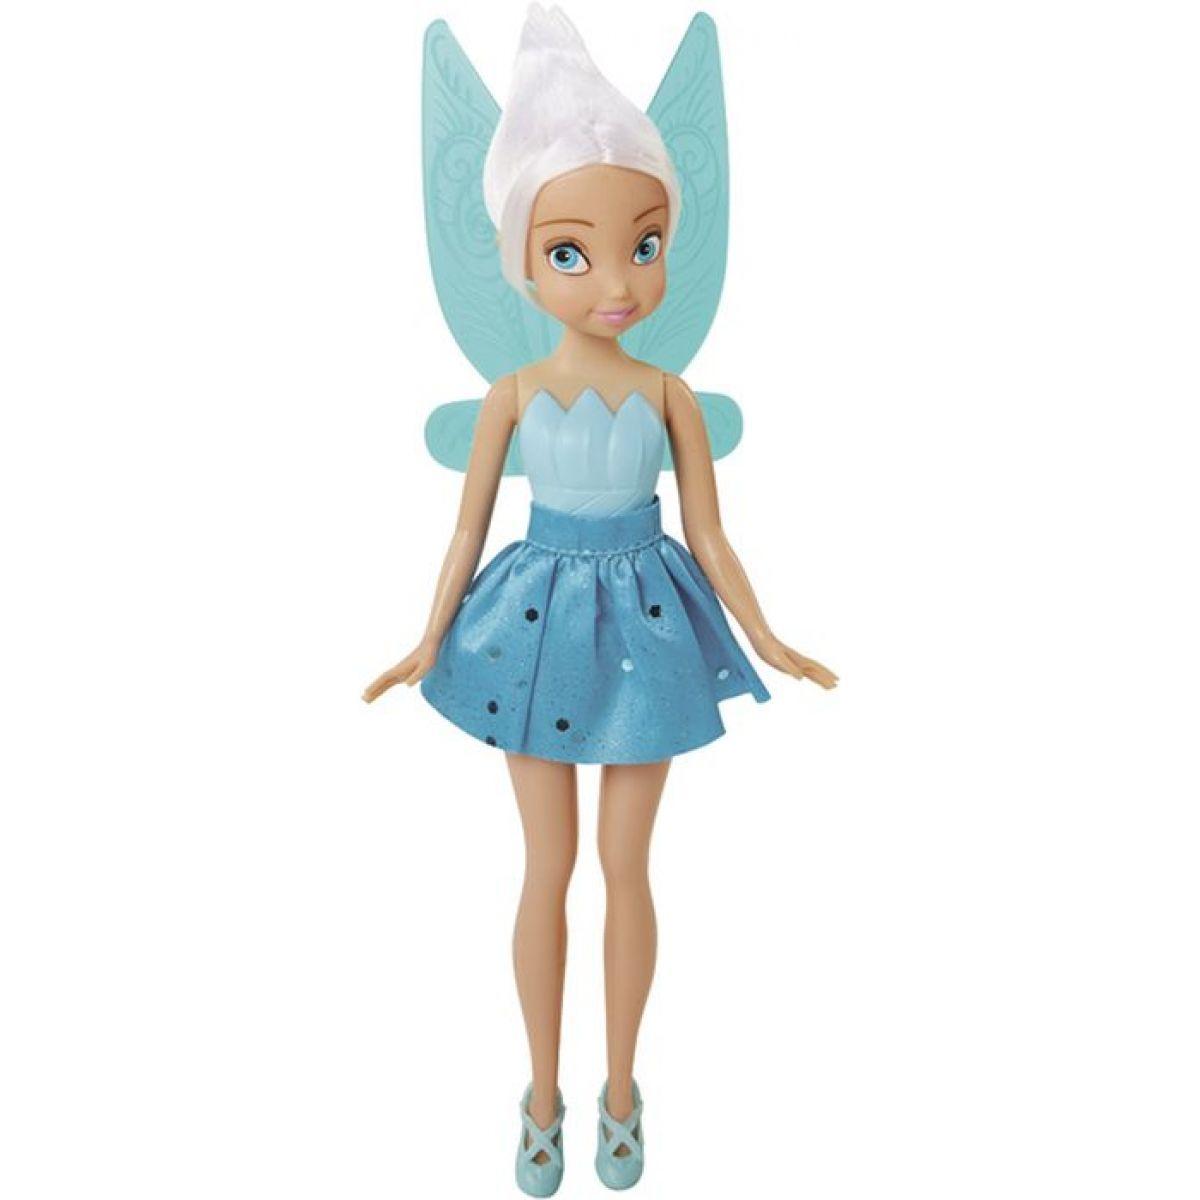 ADC Blackfire Disney Fairies Panenka baletka - Modrovločka - Periwinkle